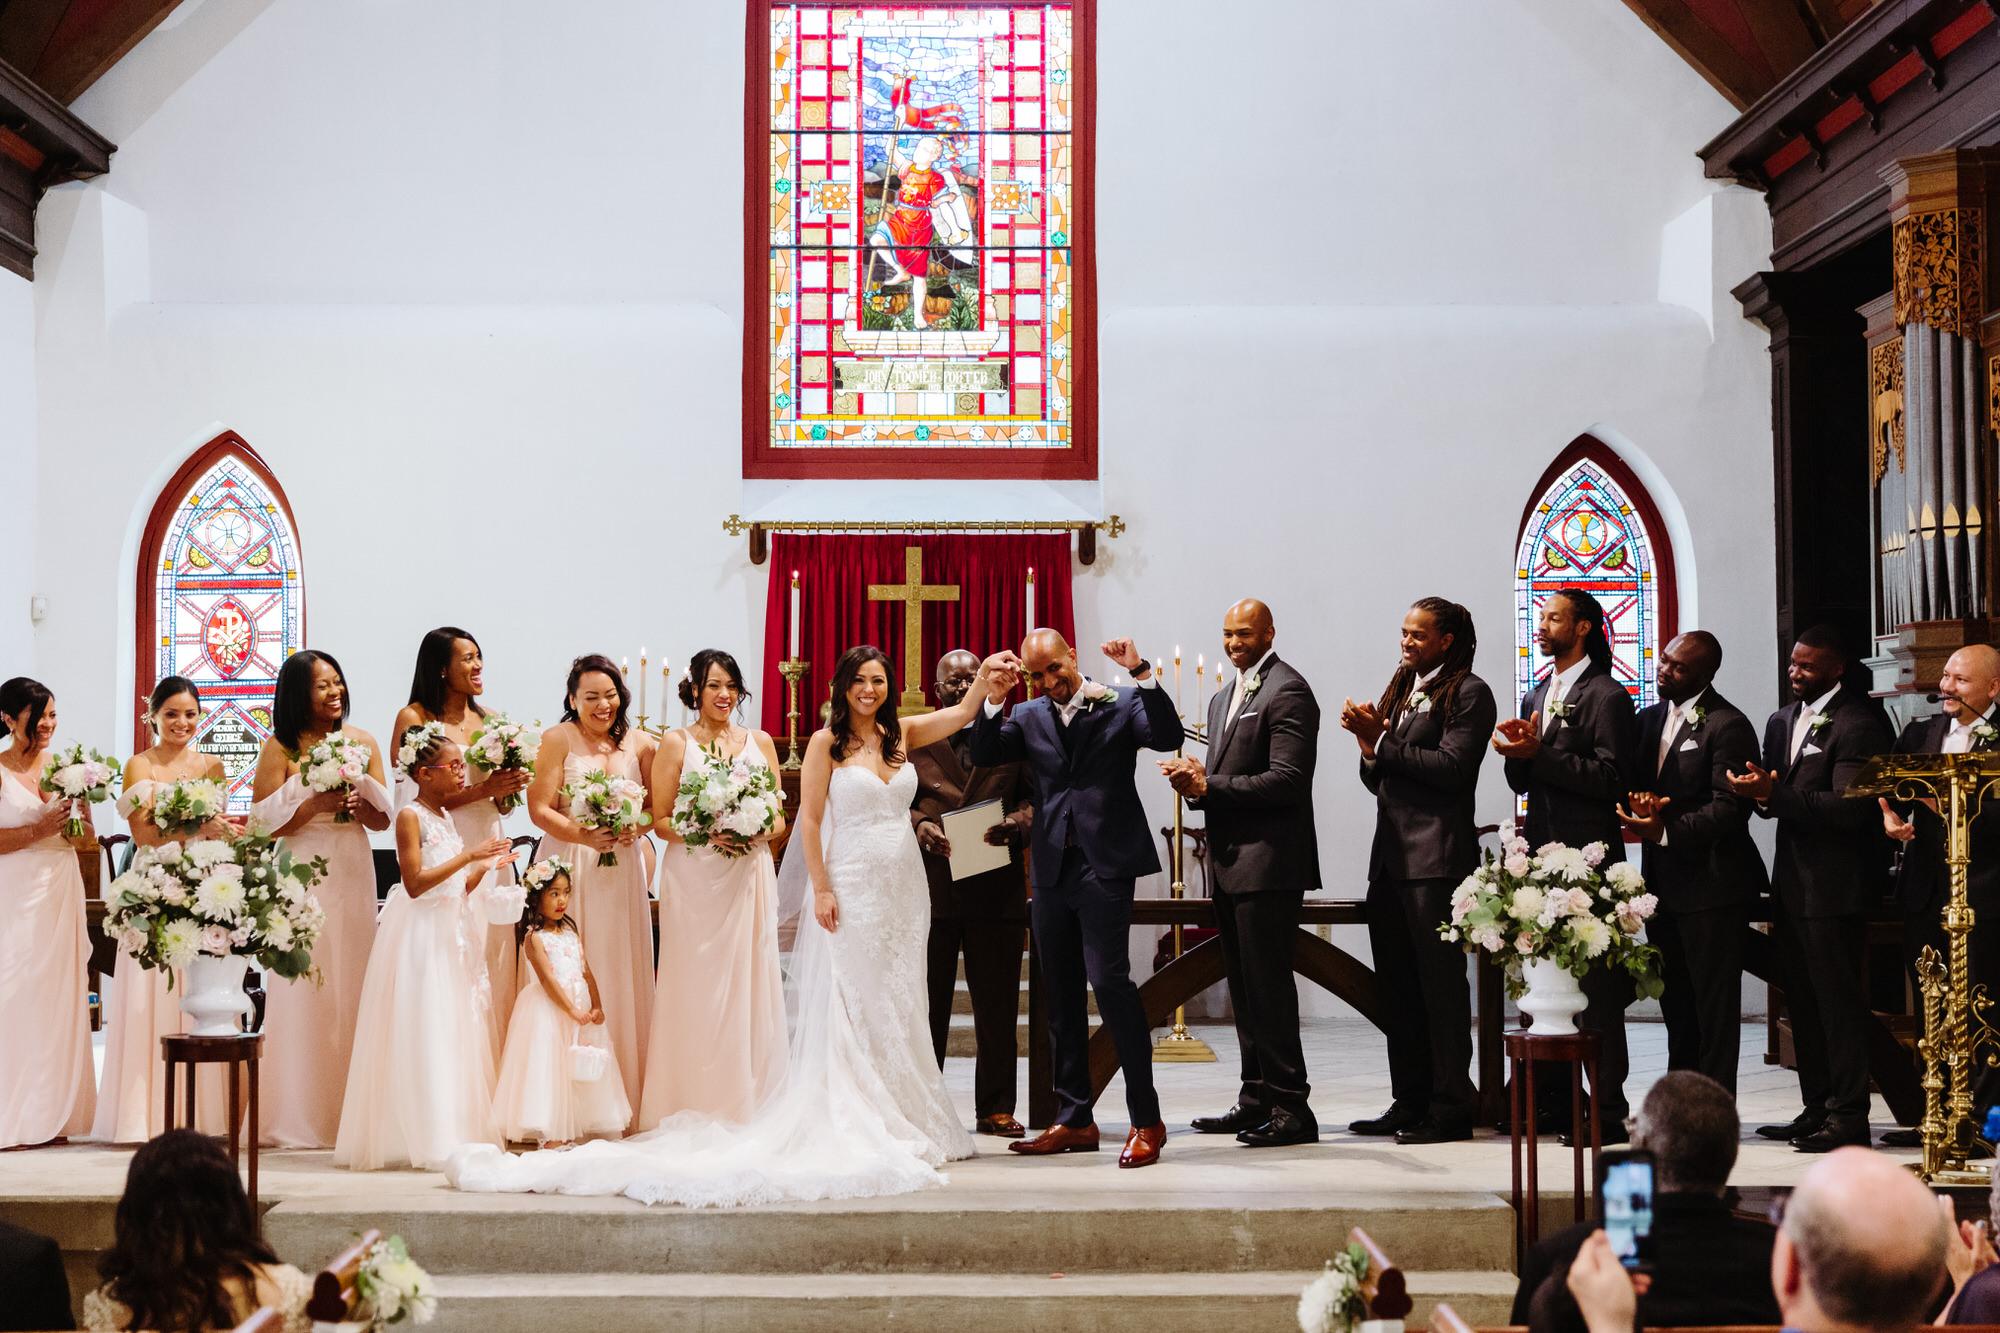 st-lukes-chapel-cannon-green-charleston-wedding-929.JPG